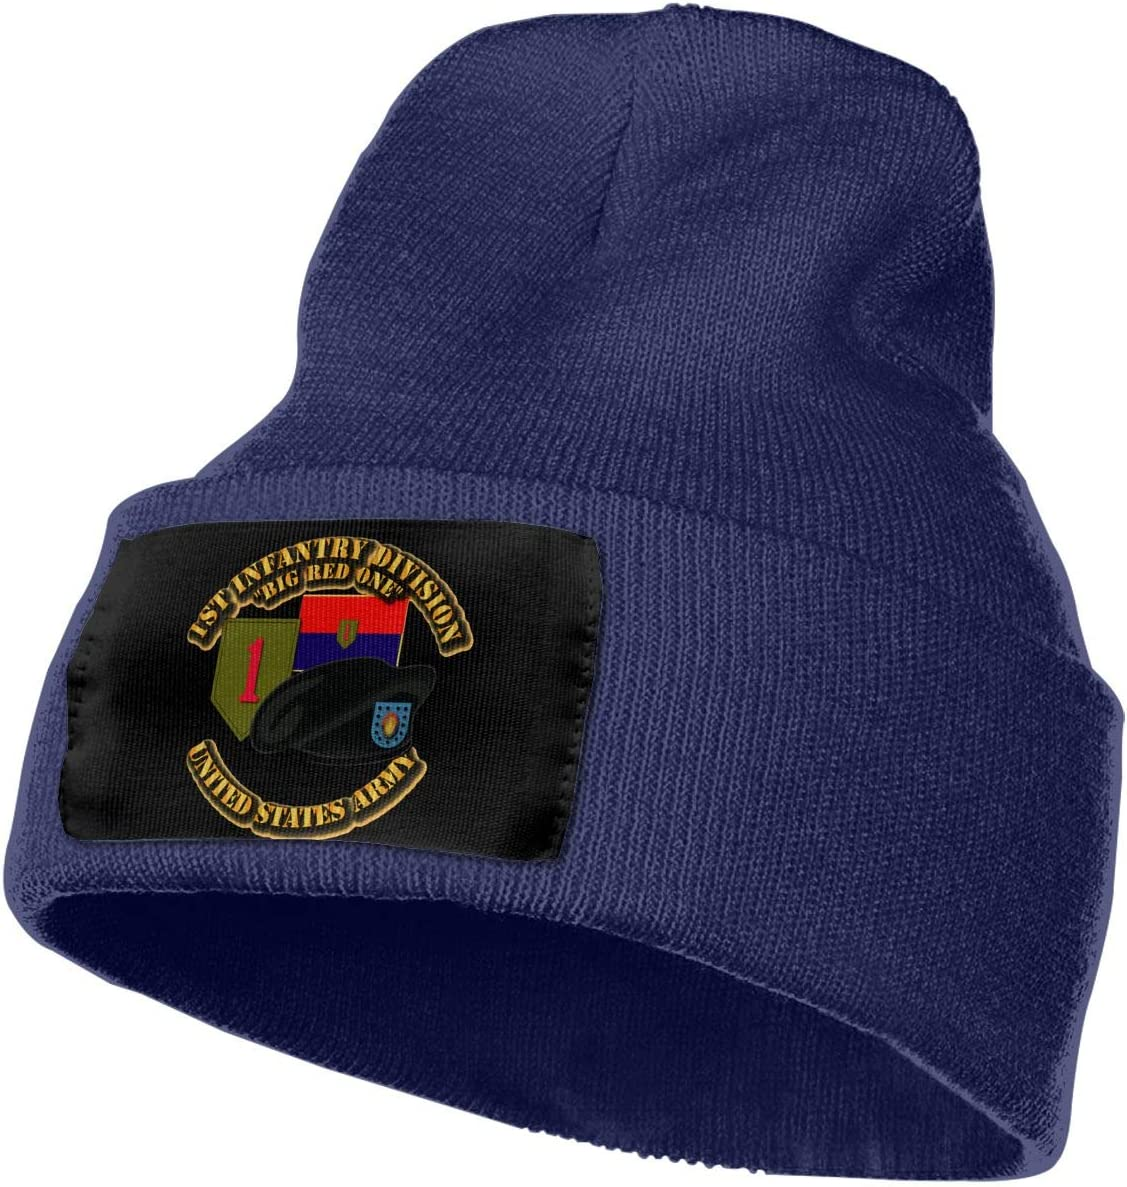 Army 1st Infantry Division Men/&Women Warm Winter Knit Plain Beanie Hat Skull Cap Acrylic Knit Cuff Hat